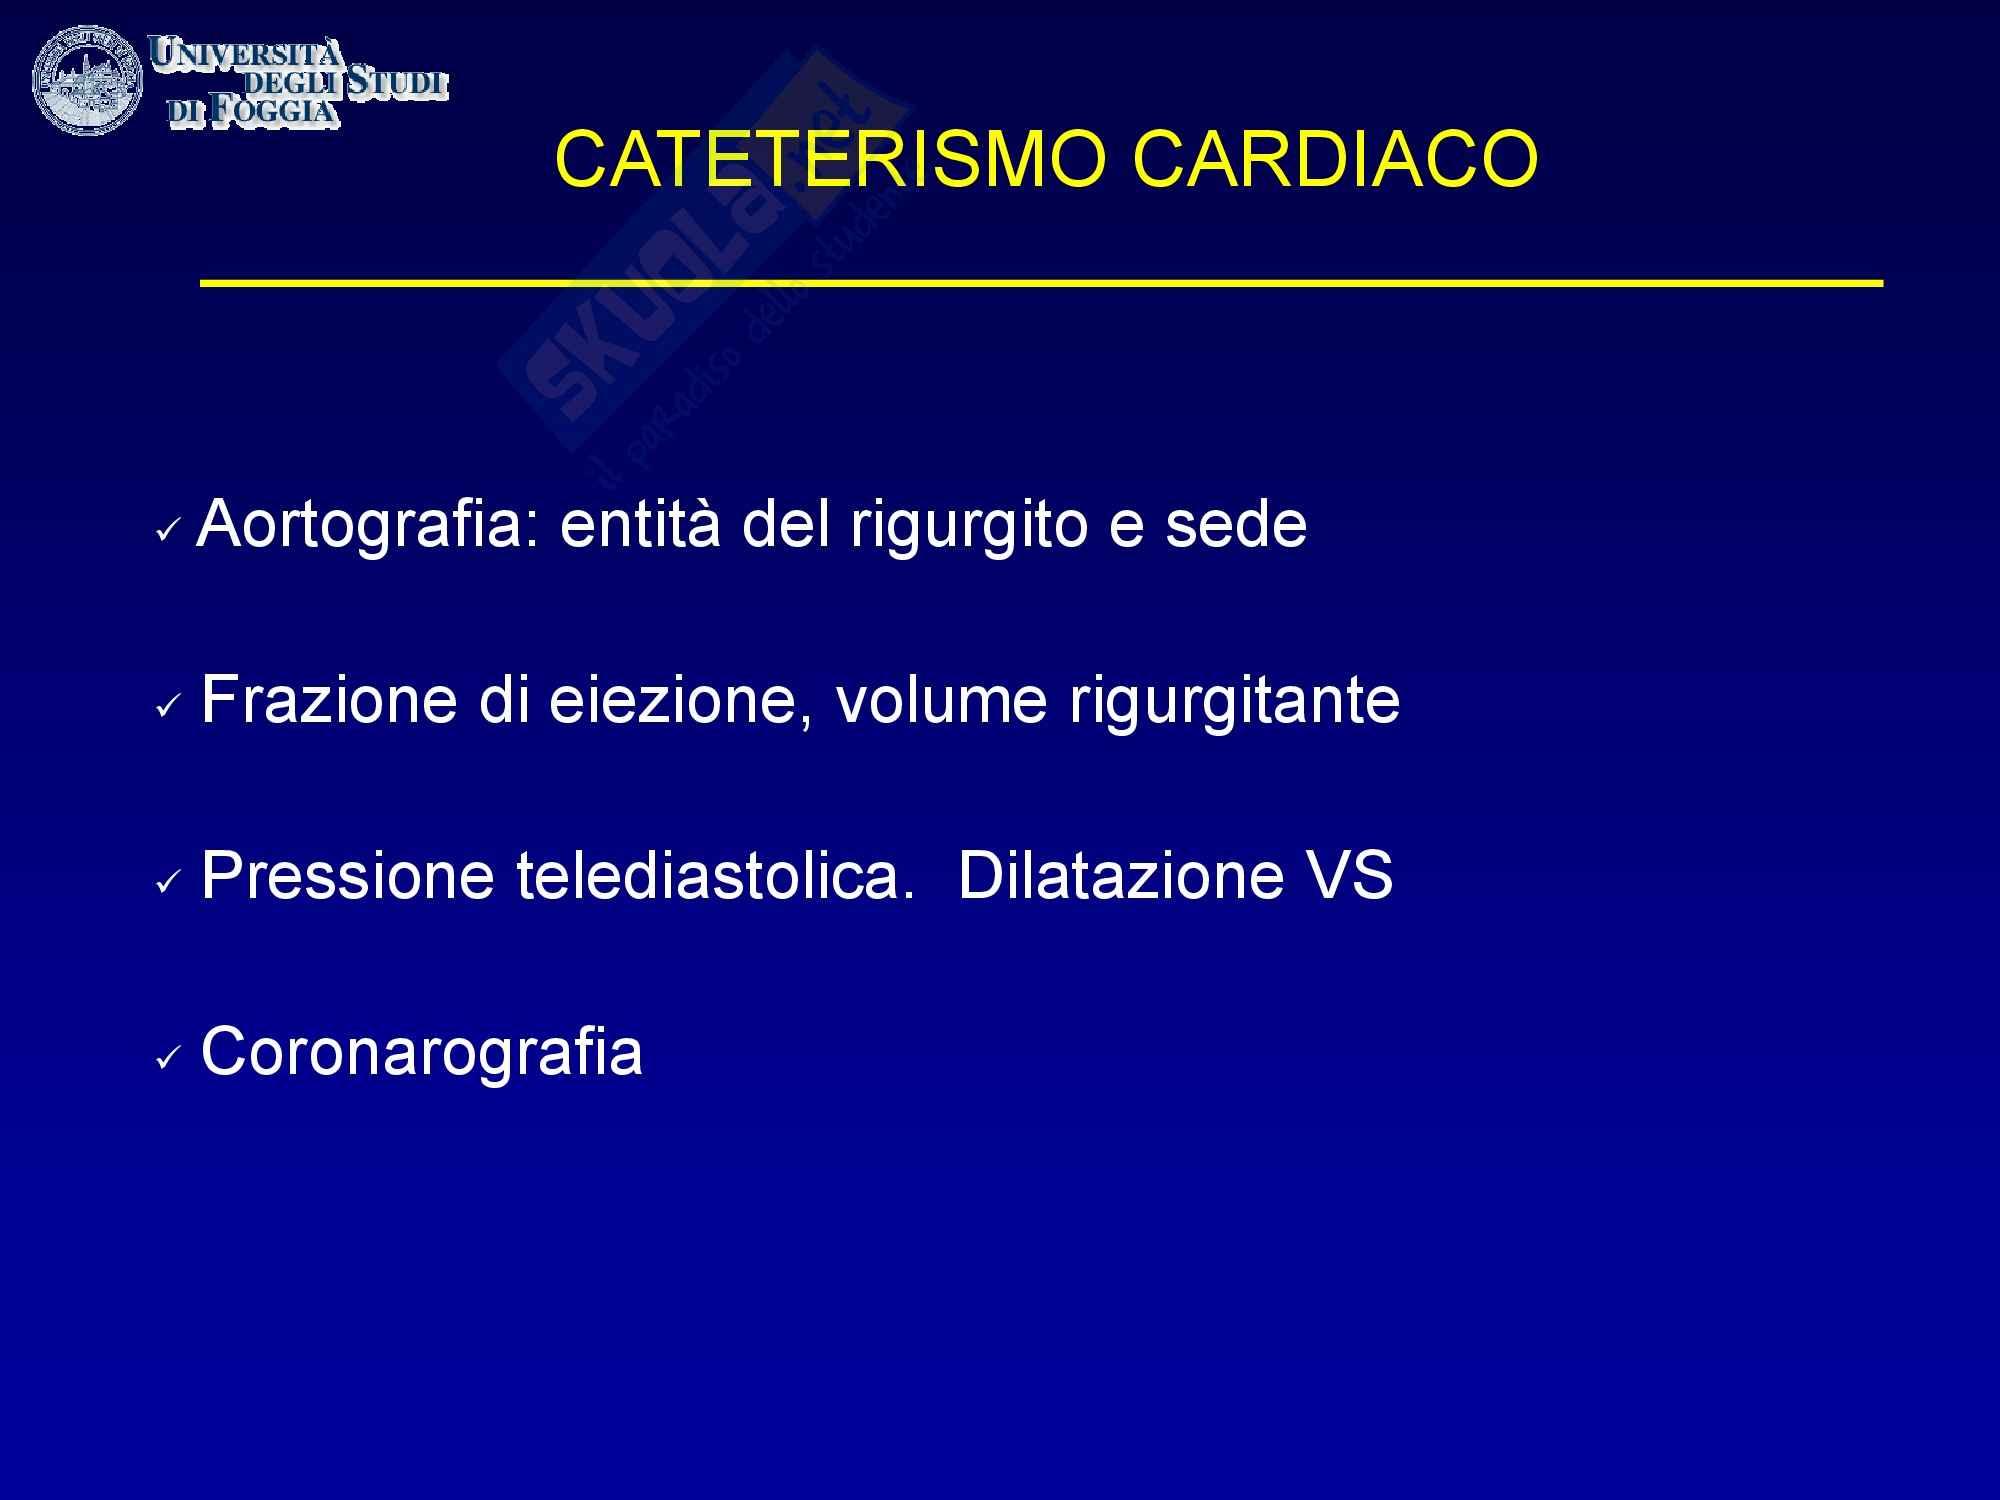 Cardiologia - il cateterismo cardiaco